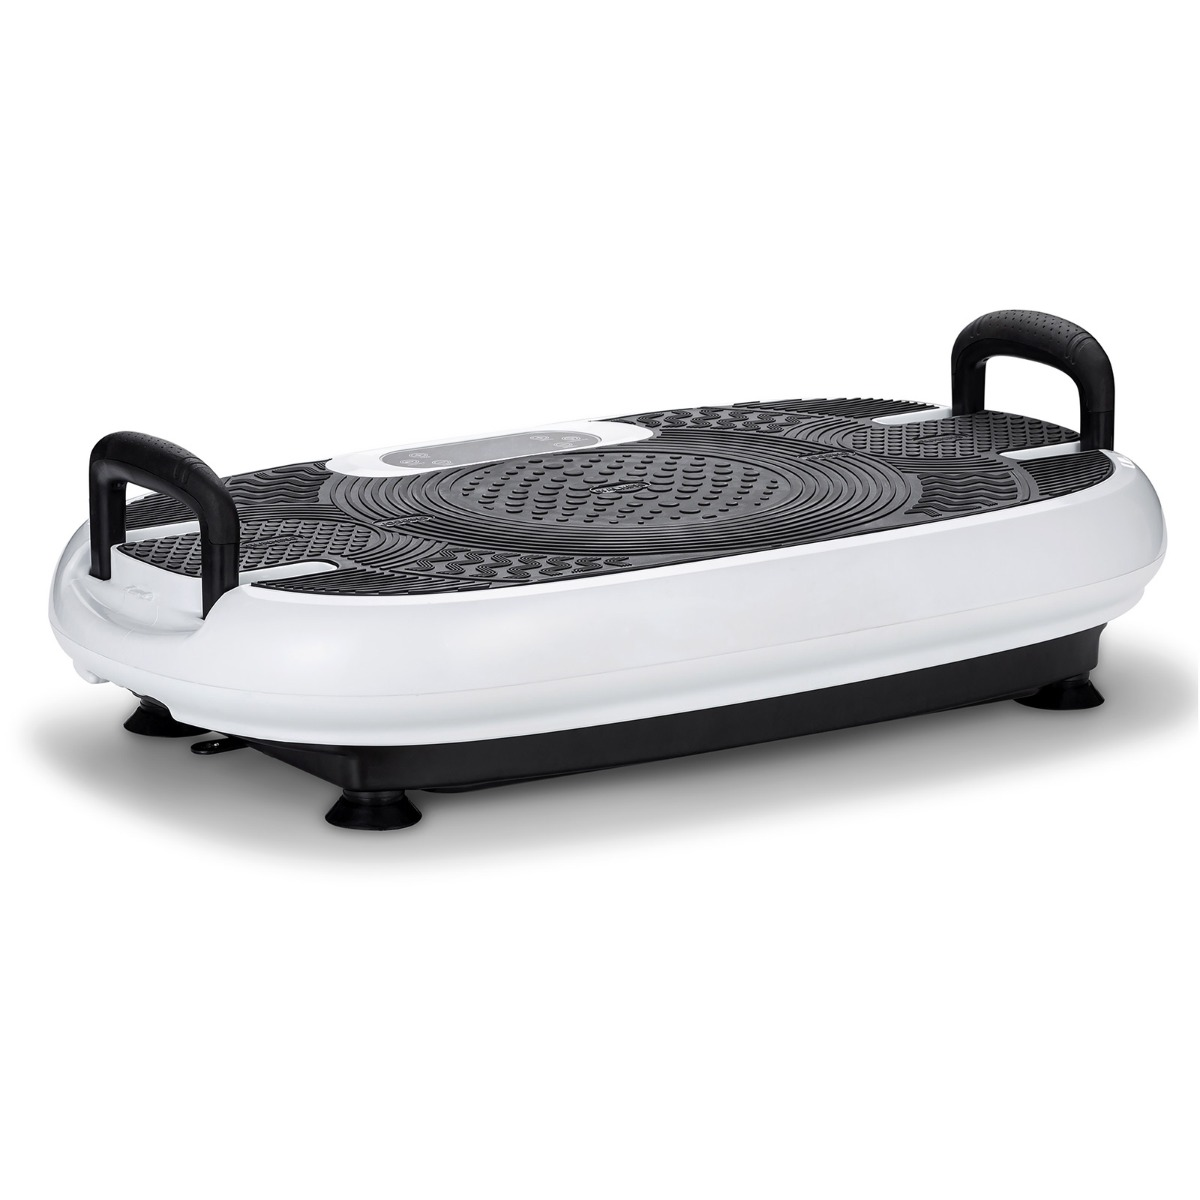 Refurbished VibroSlim Radial Plus 3D Fitness Vibration Plate - White